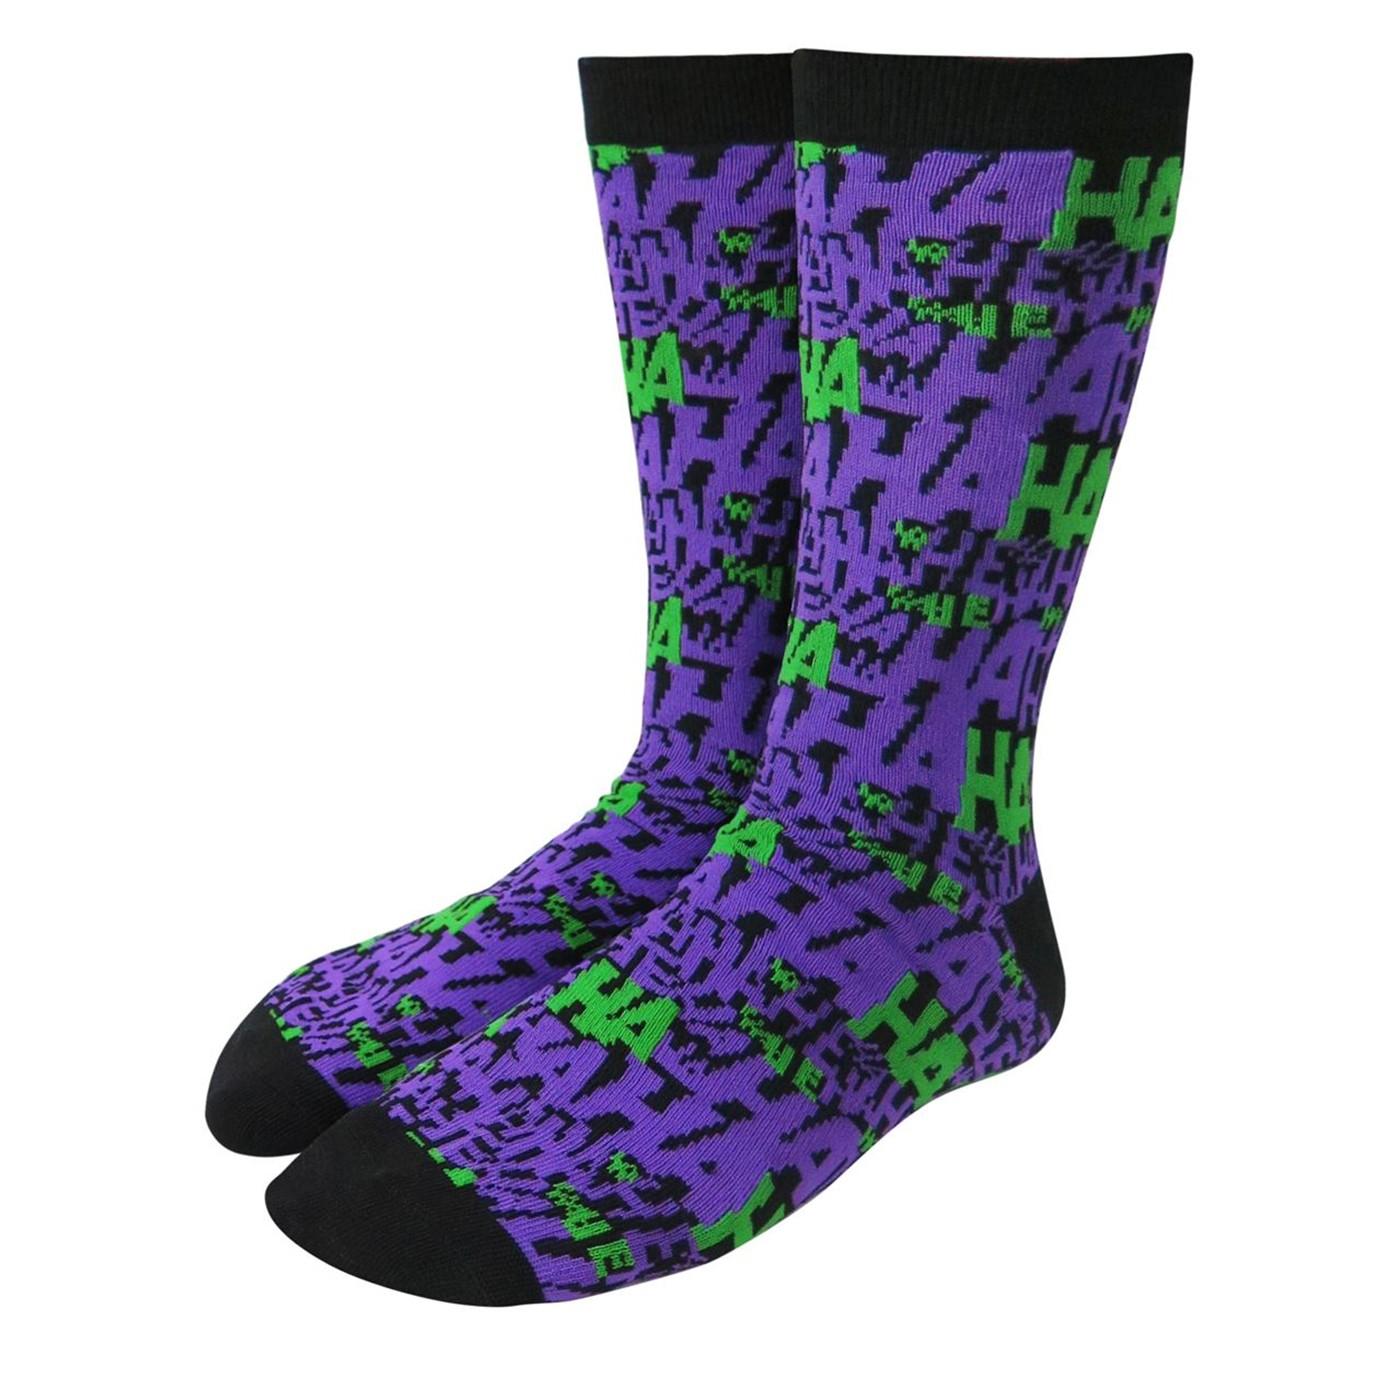 Joker HAHA Crew Socks